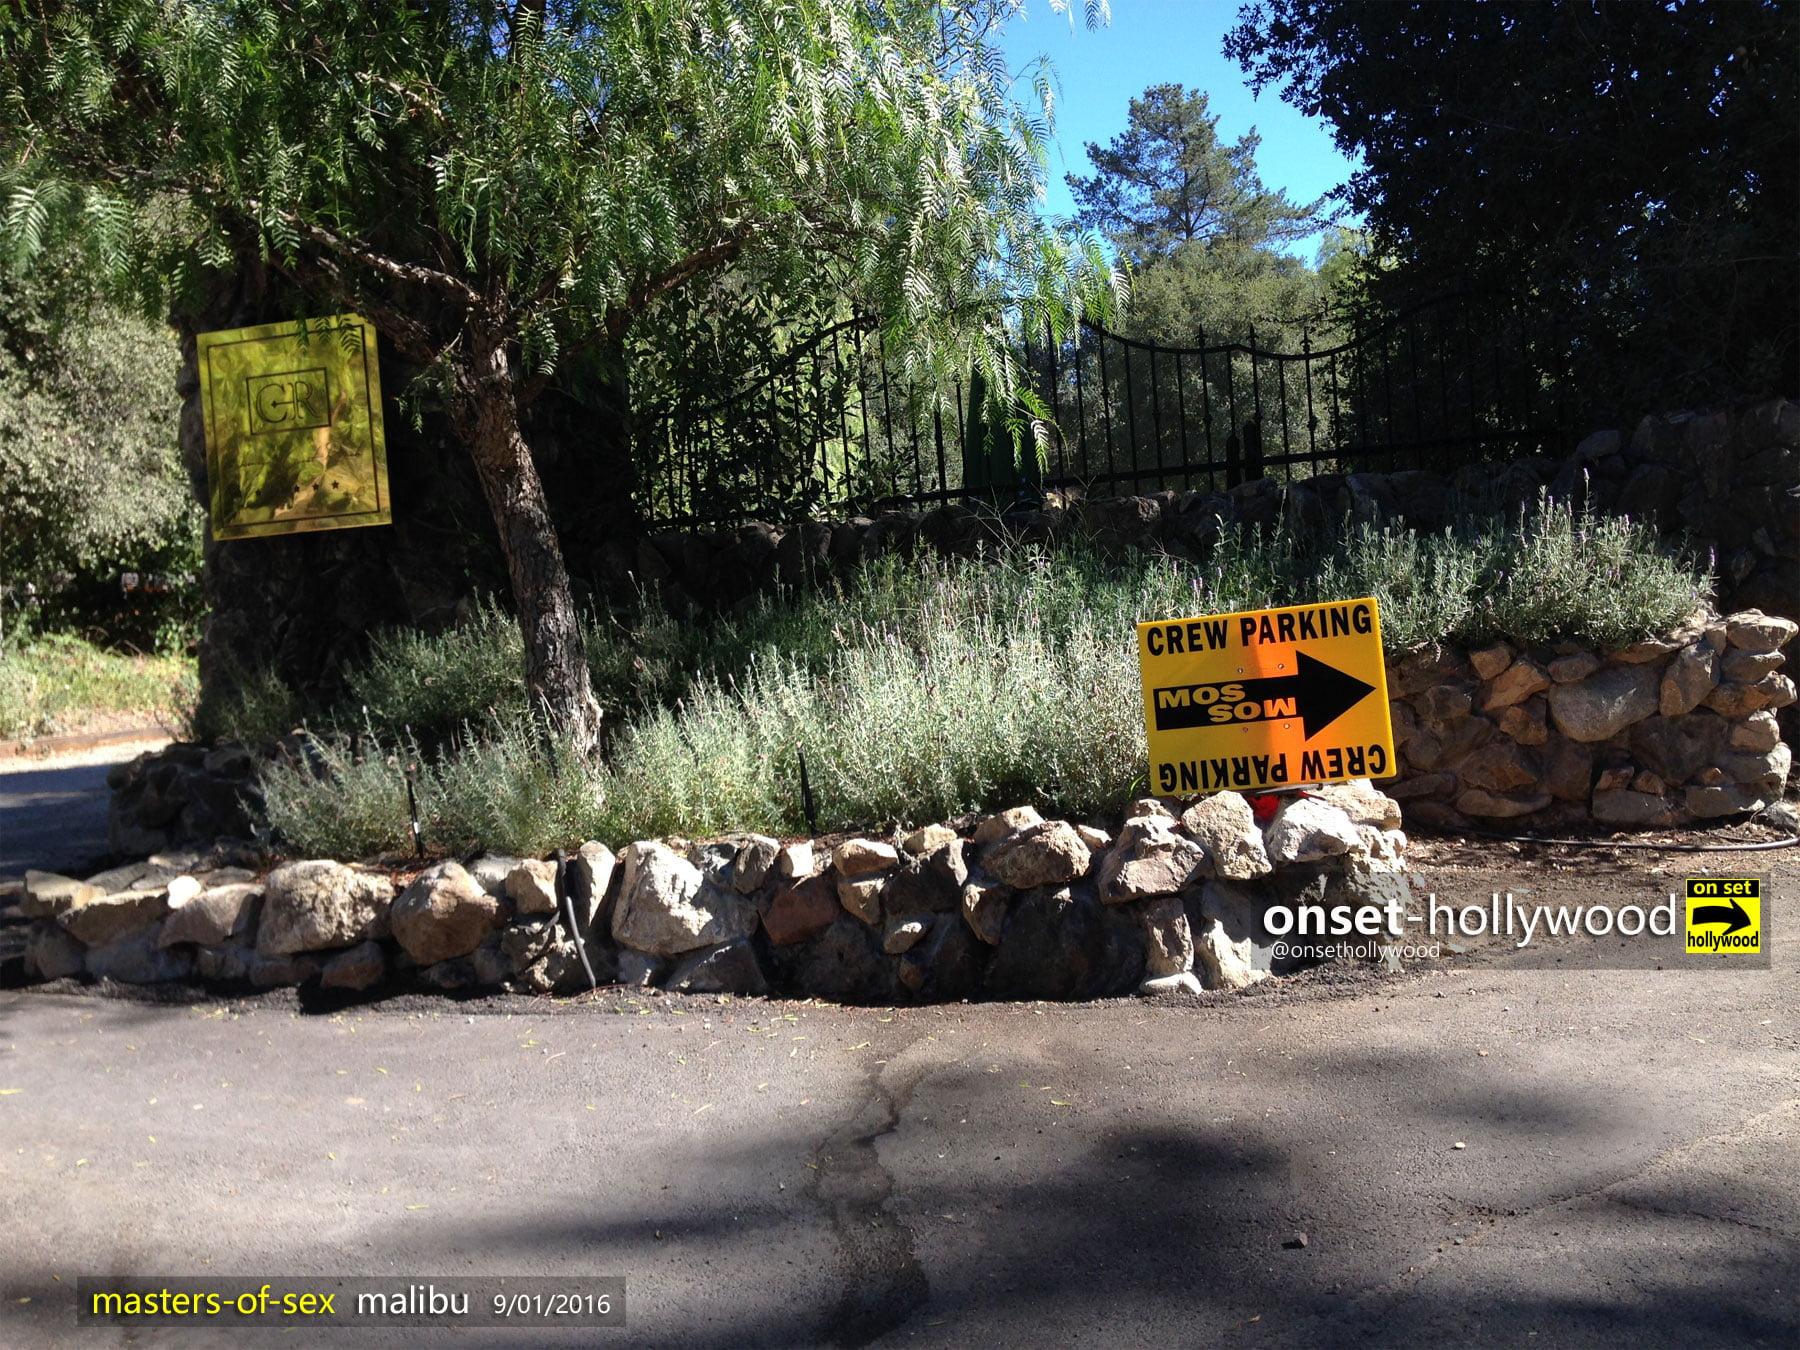 masters-of-sex-filming-locations-malibu-calamigos-ranch-1